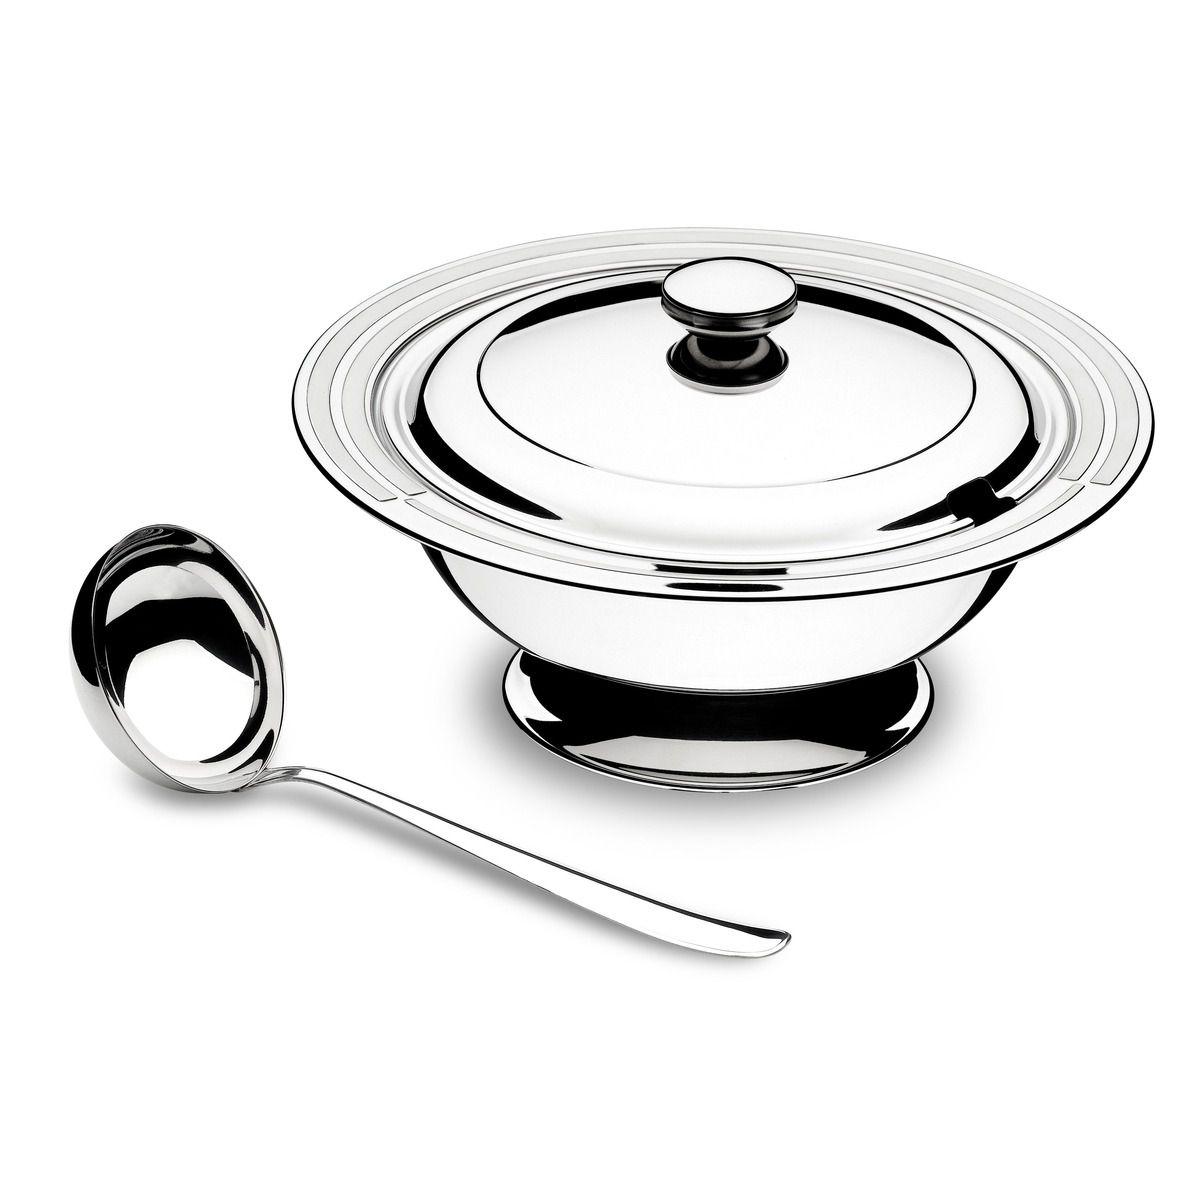 Kit Para Sopa Aço Inox 2 Pç.